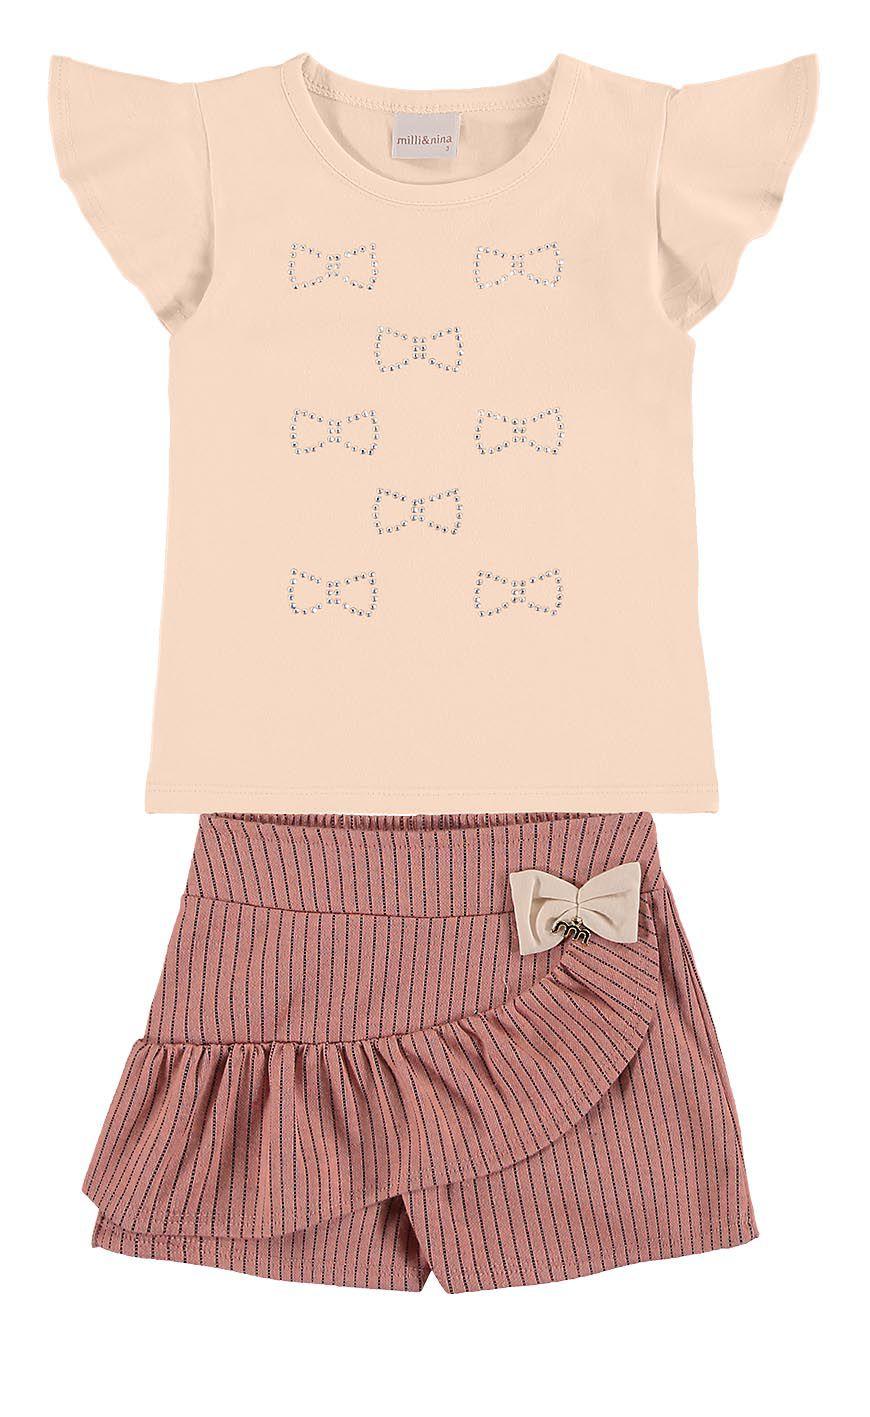 Conjunto infantil feminino Blusa em cotton e Shorts Saia risca de giz Milli & Nina